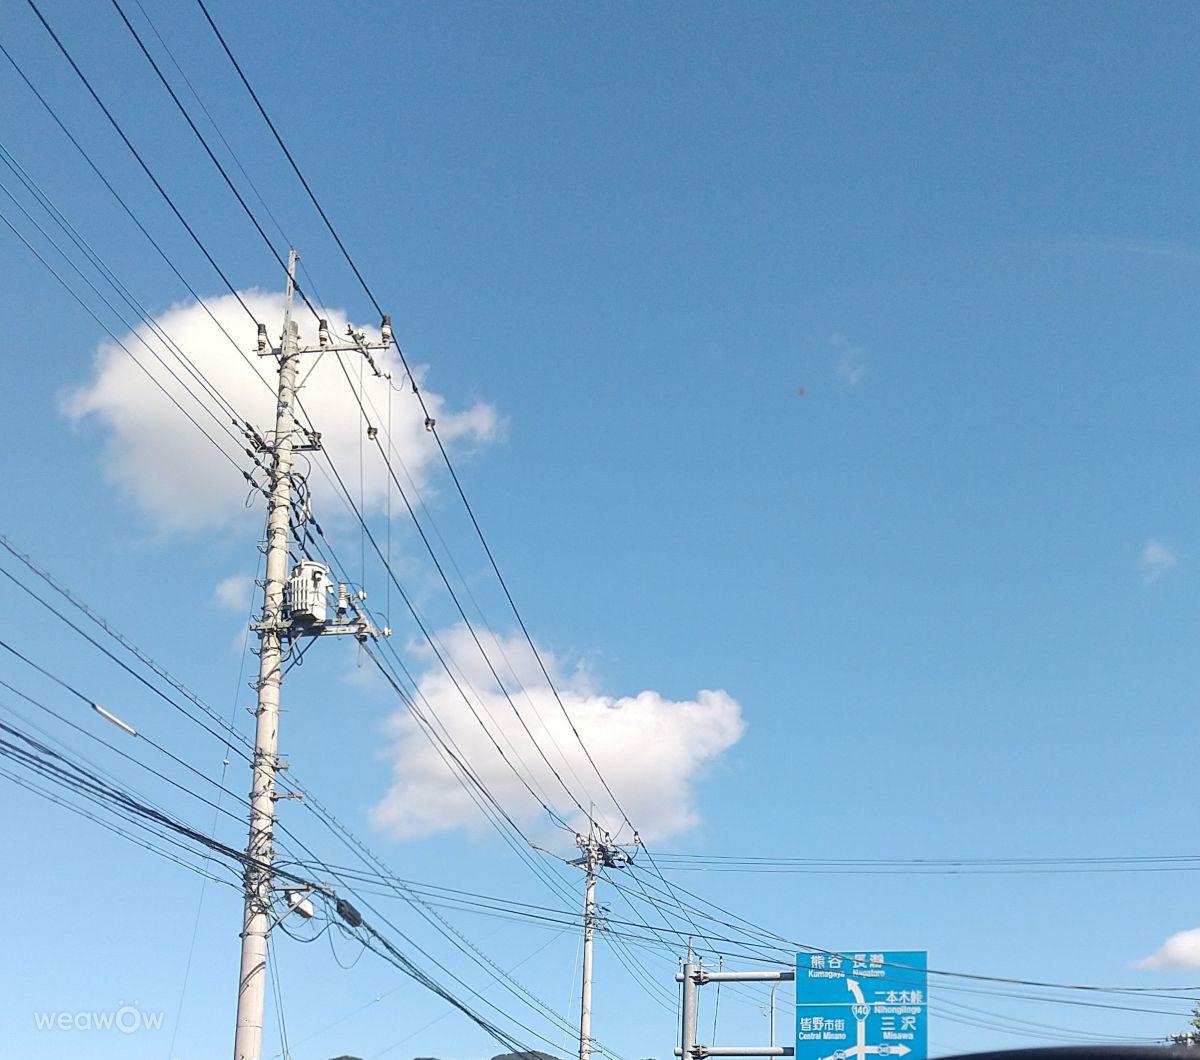 写真家 siesta、皆野町の天気写真 - Weawow